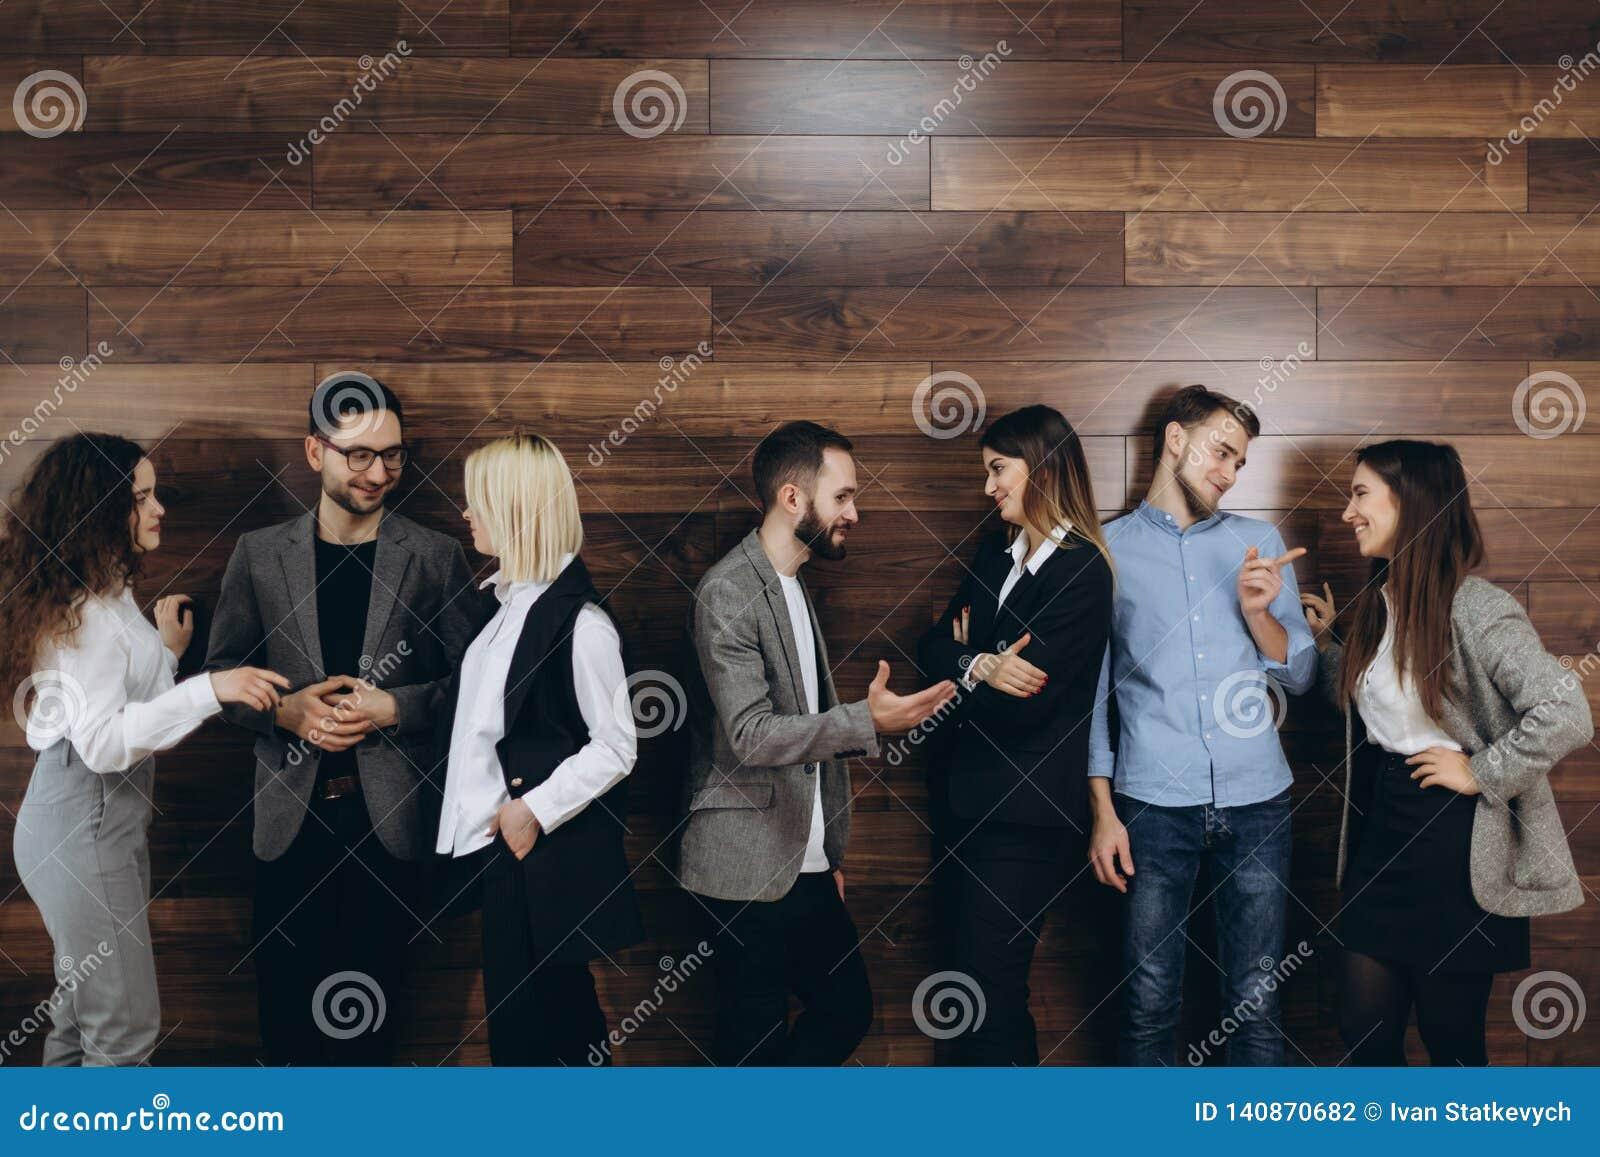 Multi-ethnic Millennial People Holding Phones And Resumes Preparing